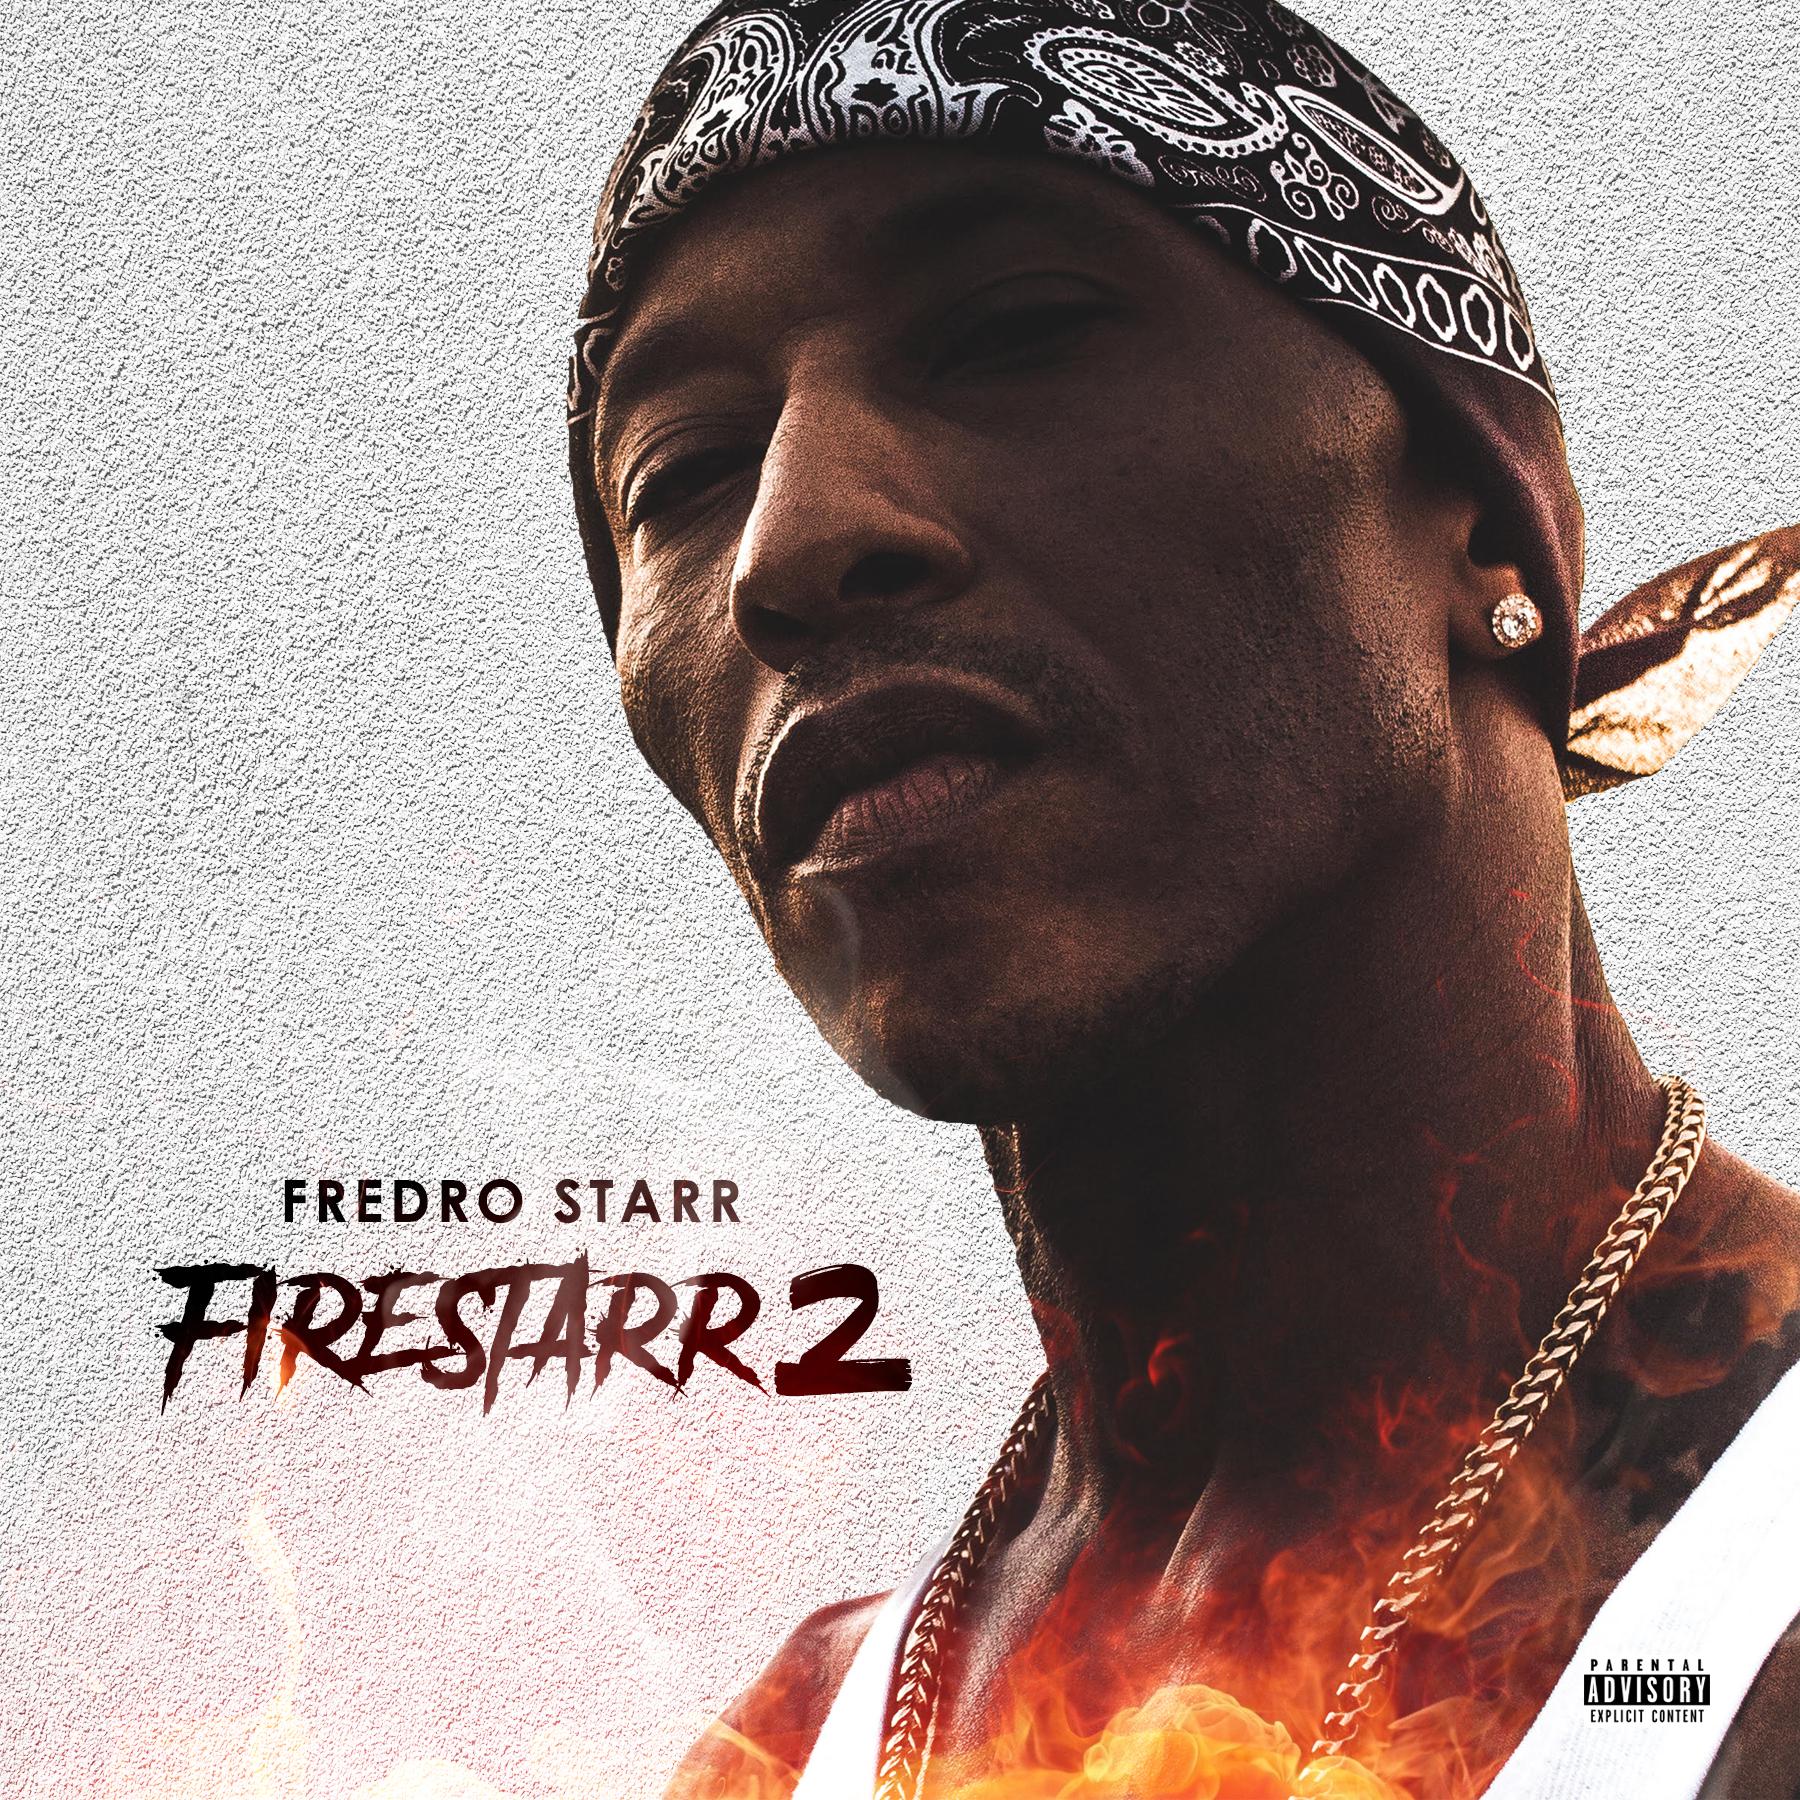 Fredro Starr - 2 Do U Know Feat. Vado & The Kid Daytona (Produced by The Korruption) [audio]